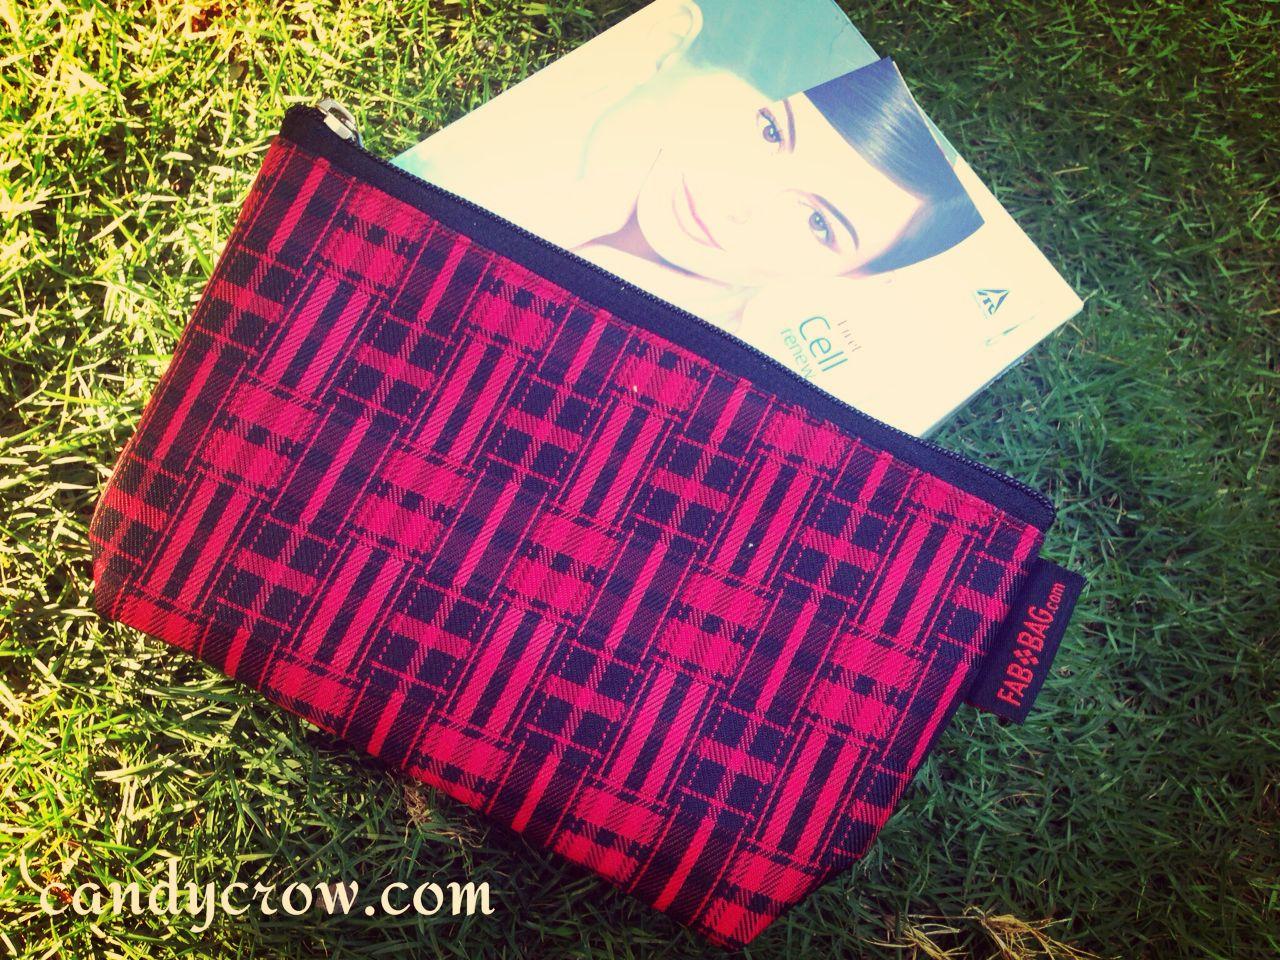 February fab bag 2014